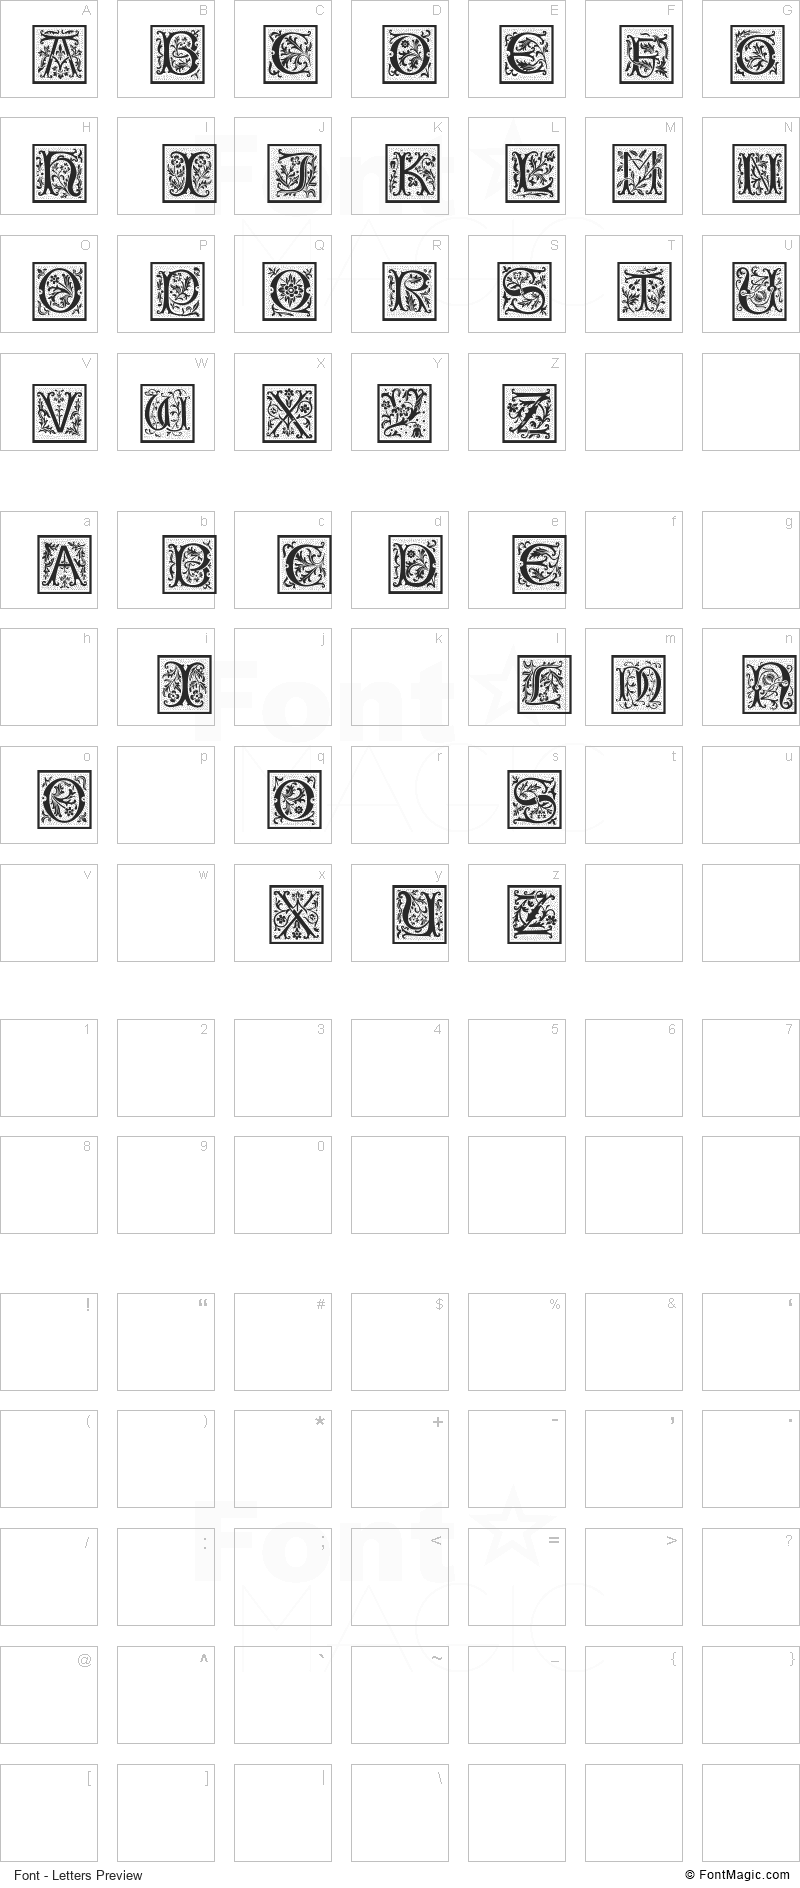 PetitFleur Font - All Latters Preview Chart